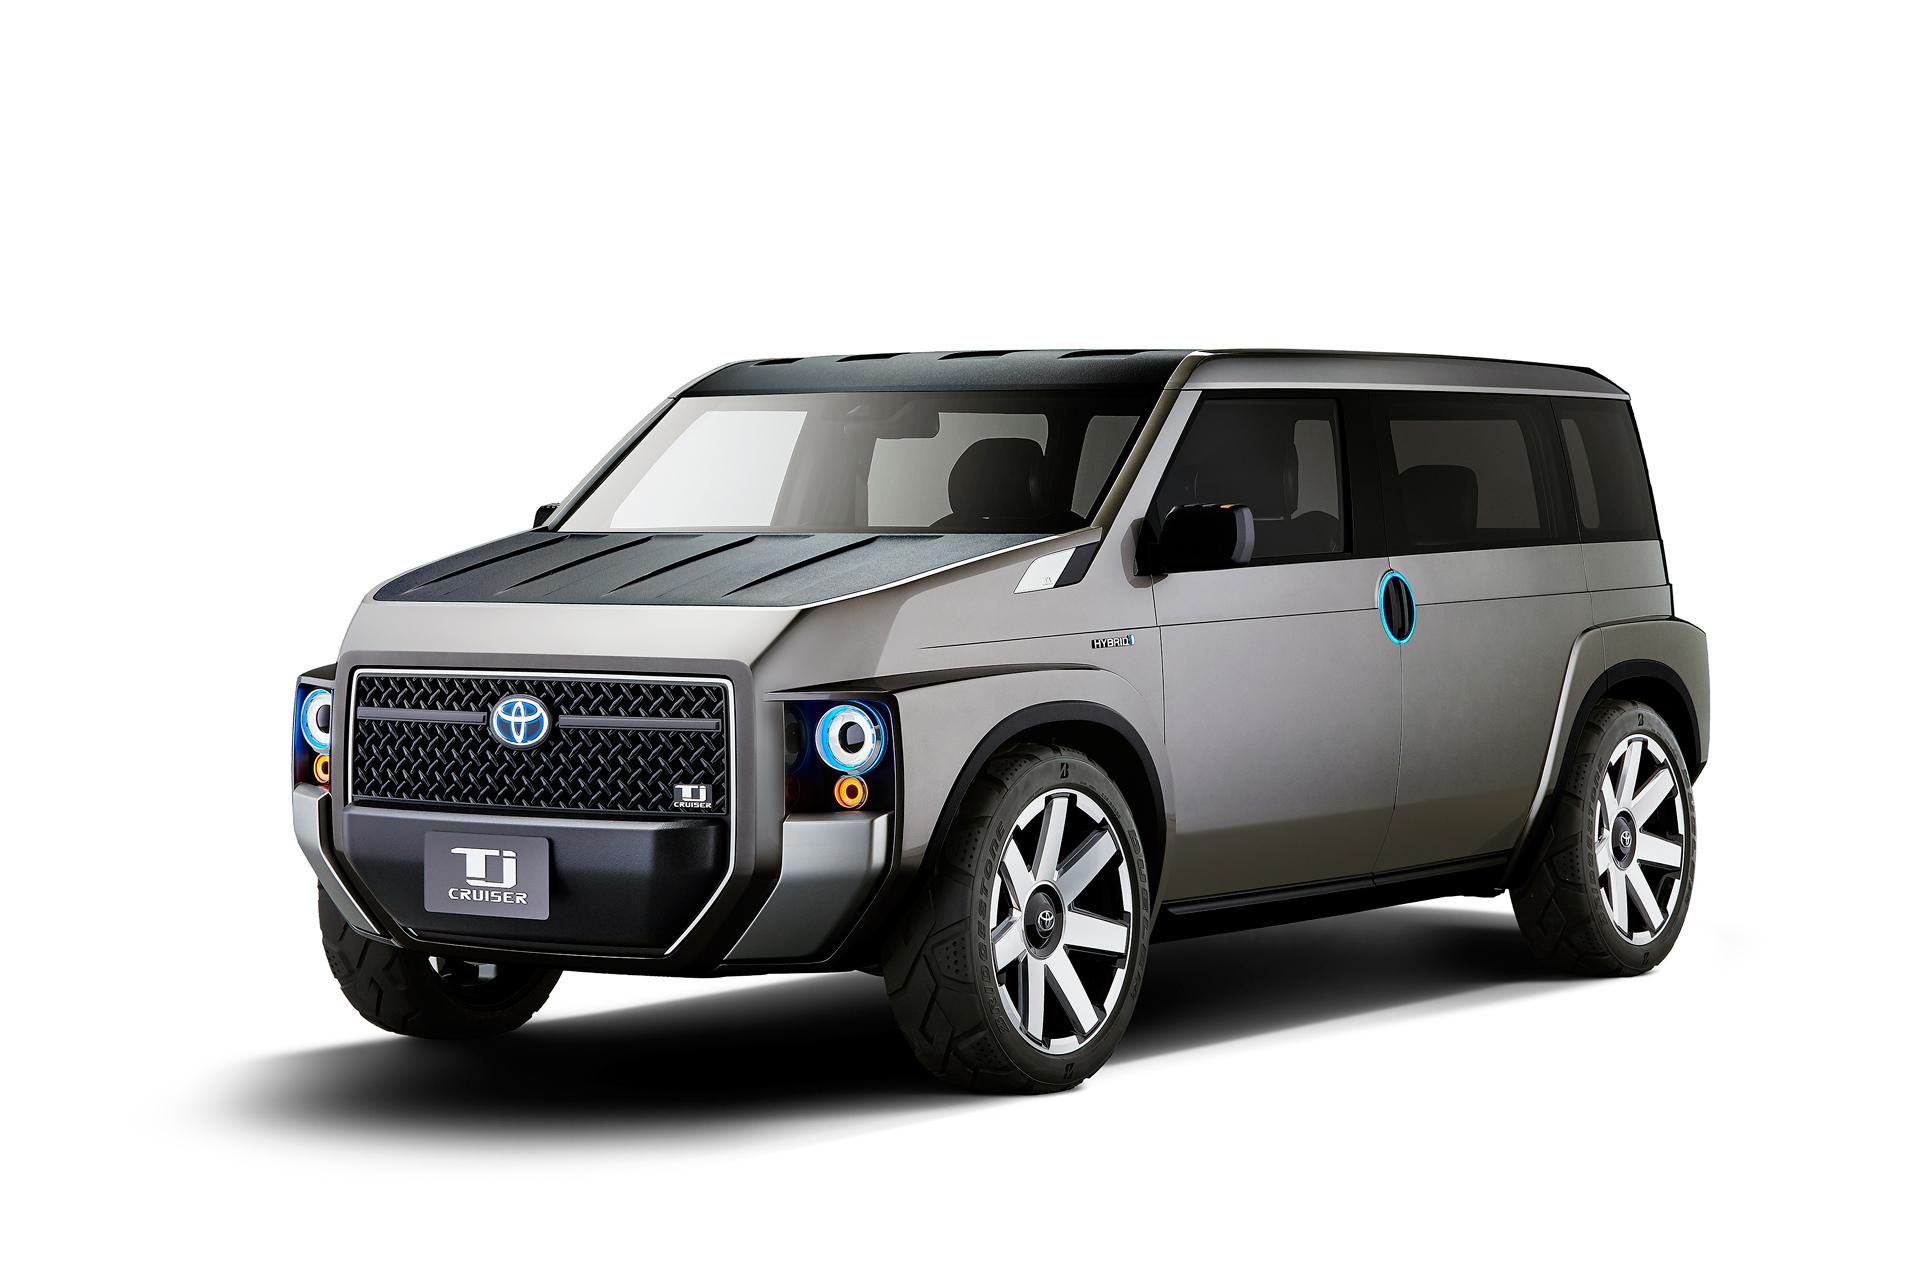 Toyota Tj Cruiser Concept : le nouveau SUV fourgon hybride